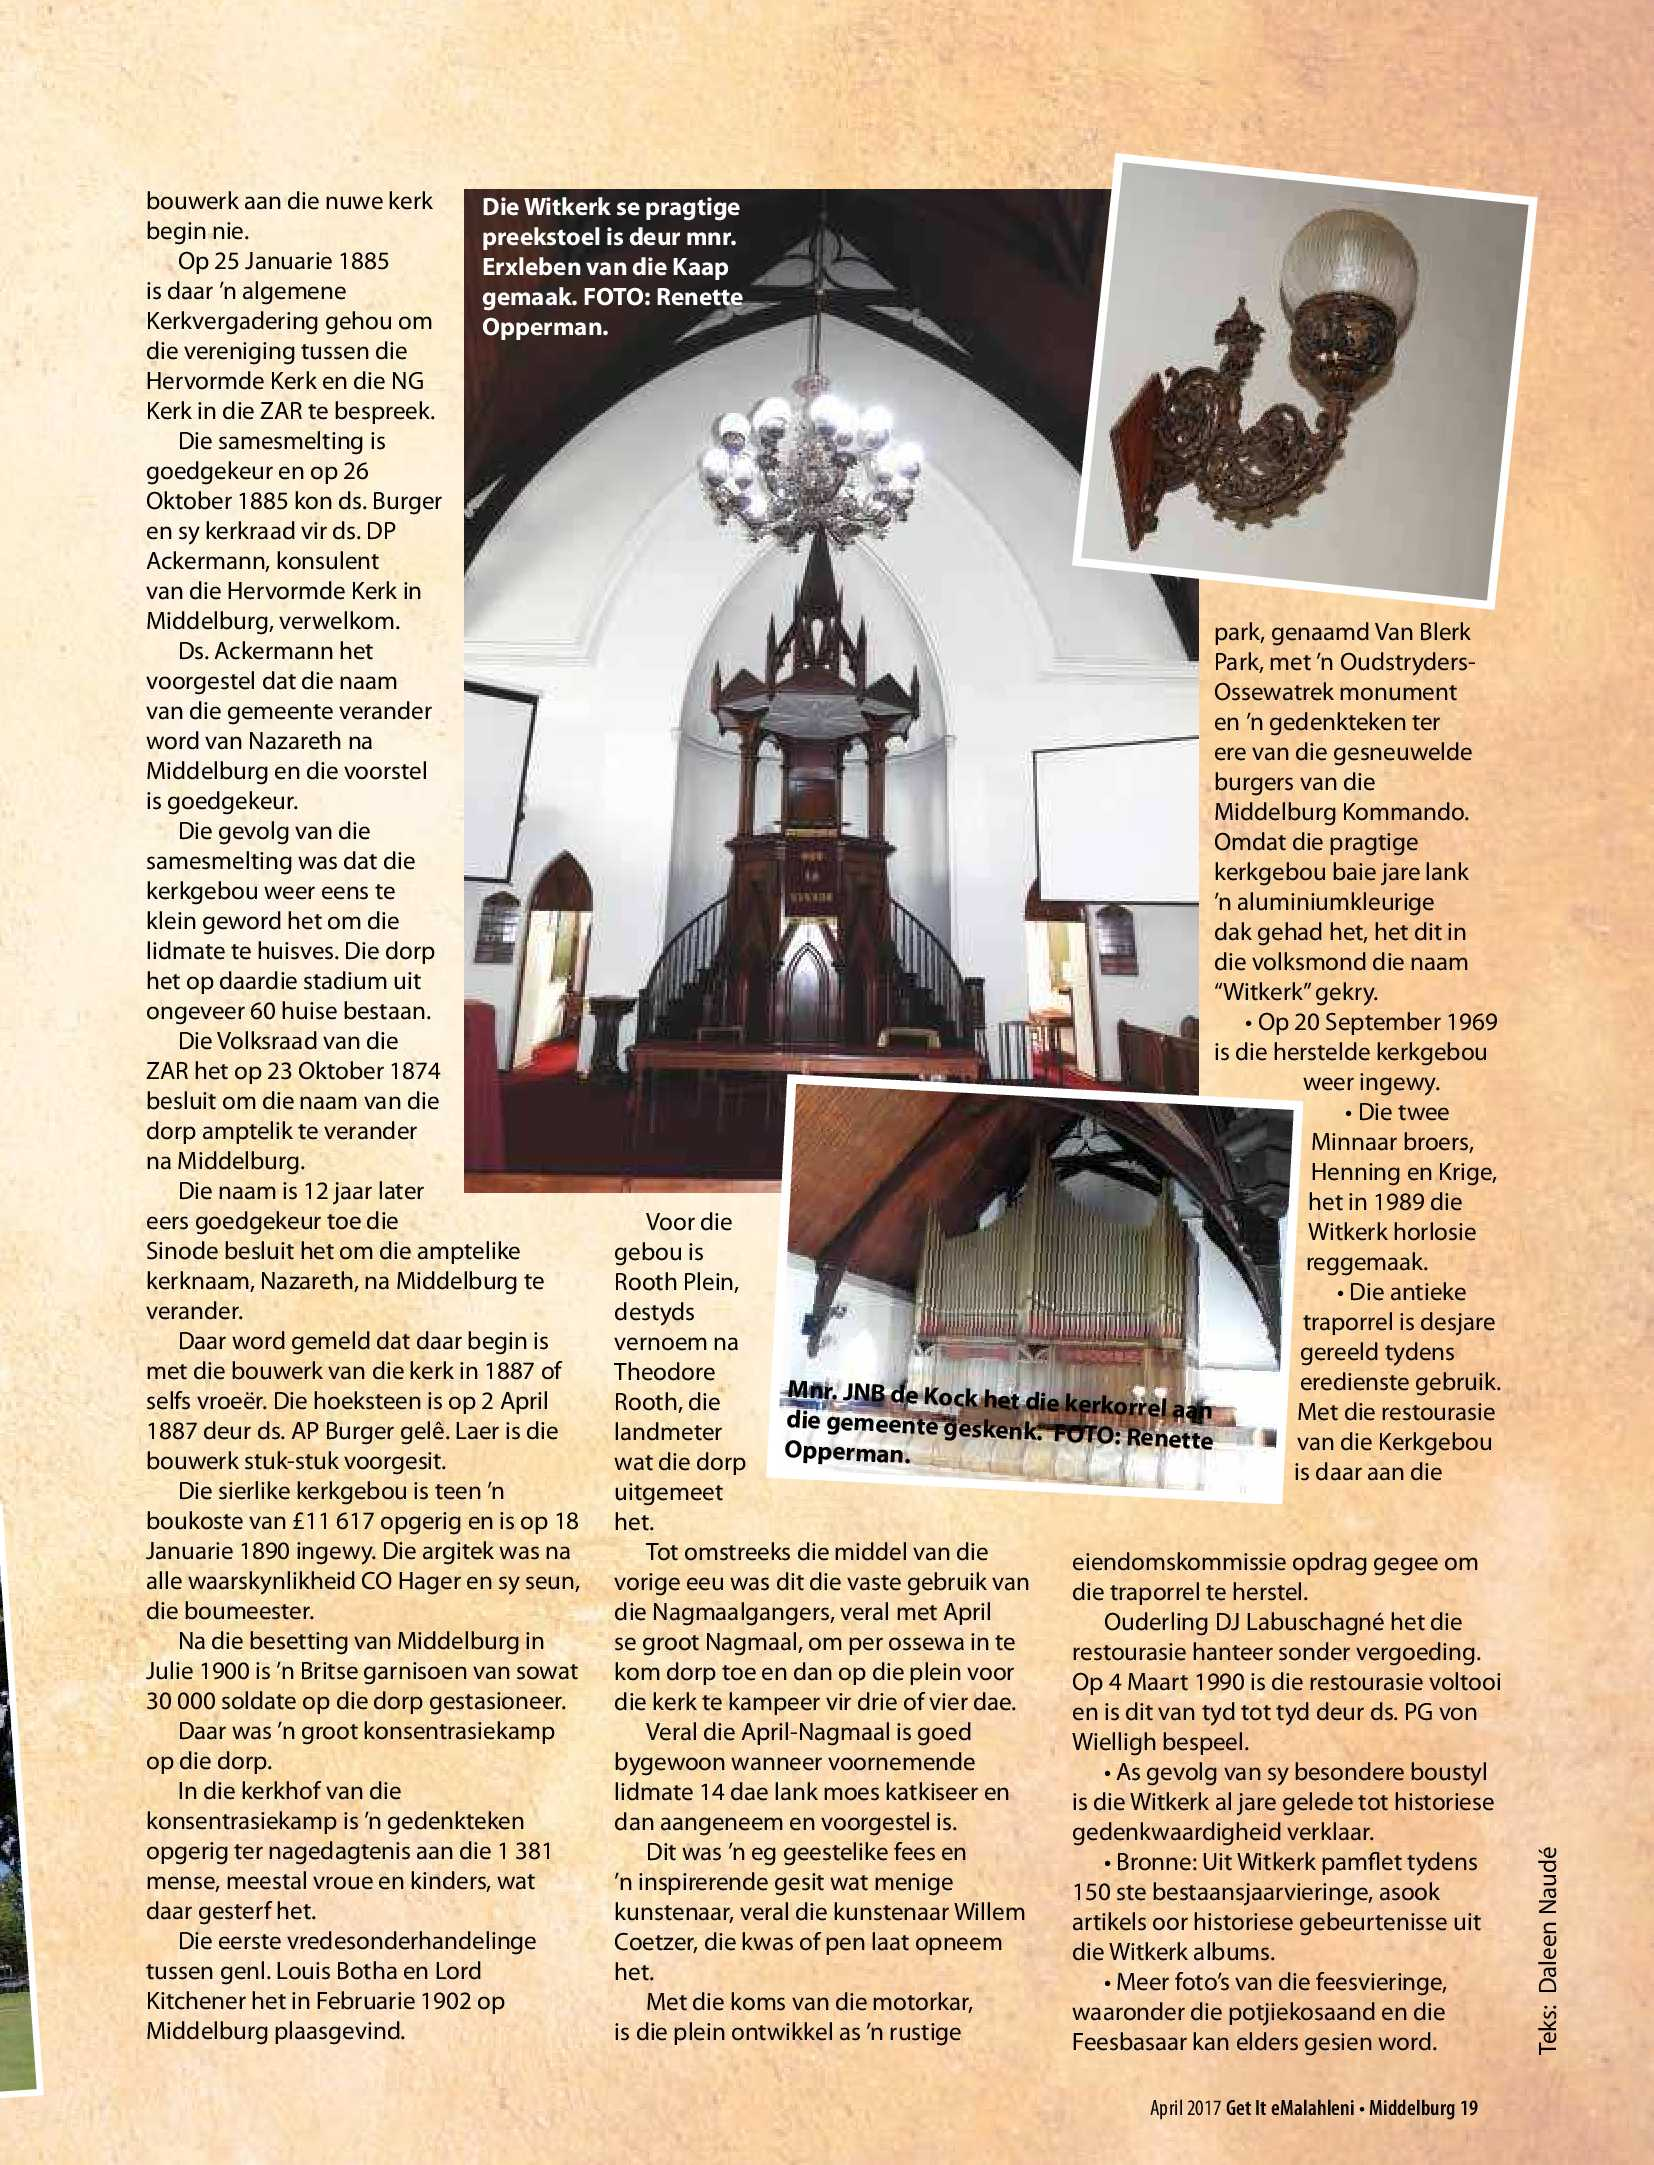 get-middelburg-april-2017-epapers-page-21